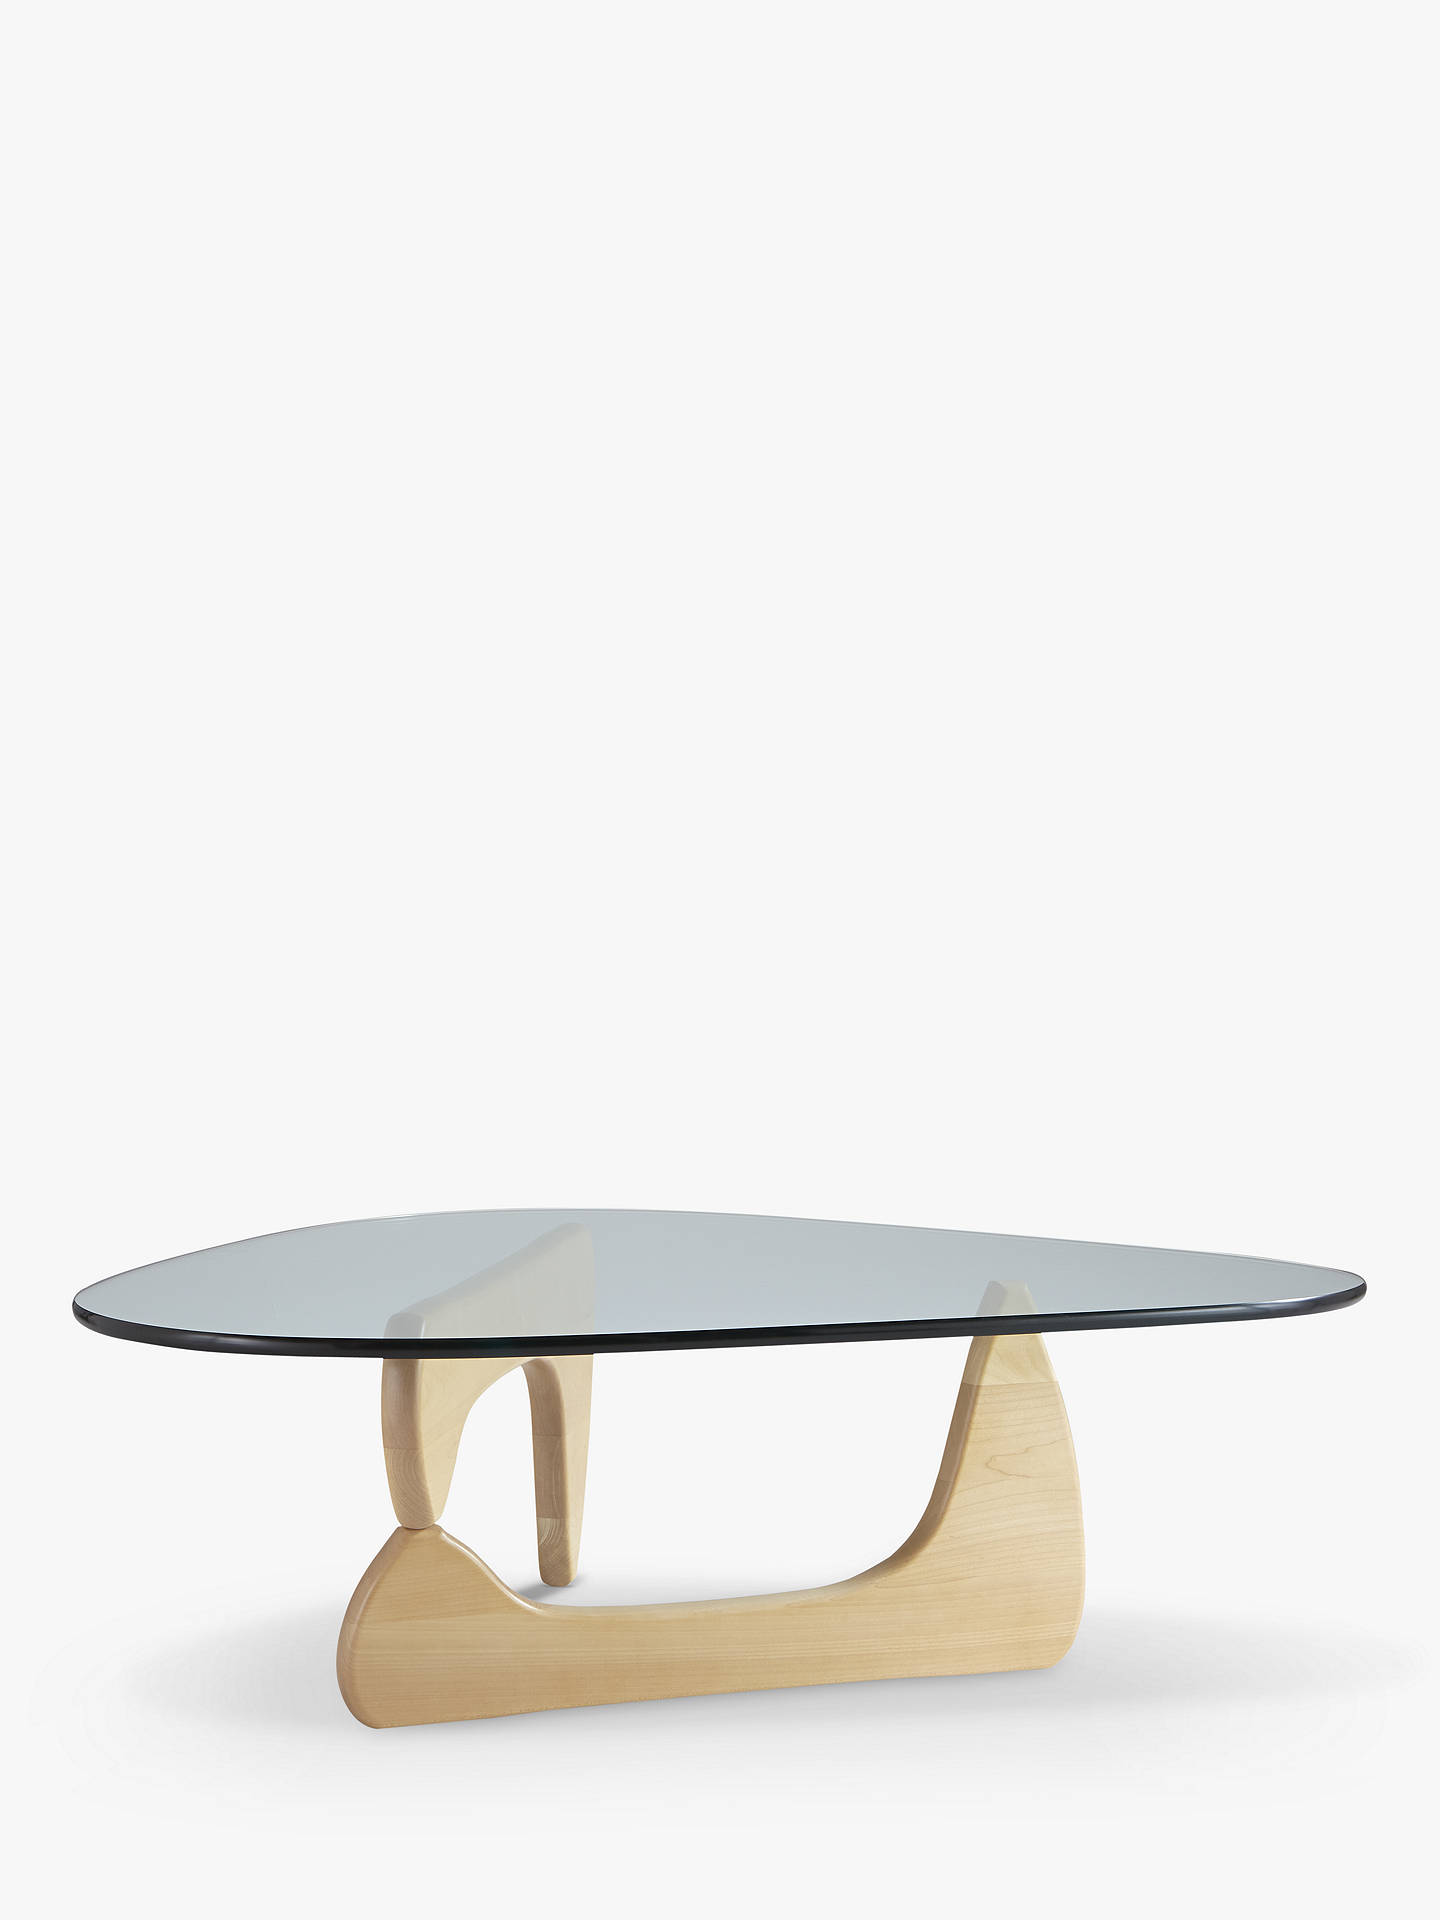 Maple Wood Coffee Table.Vitra Noguchi Coffee Table Maple Wood